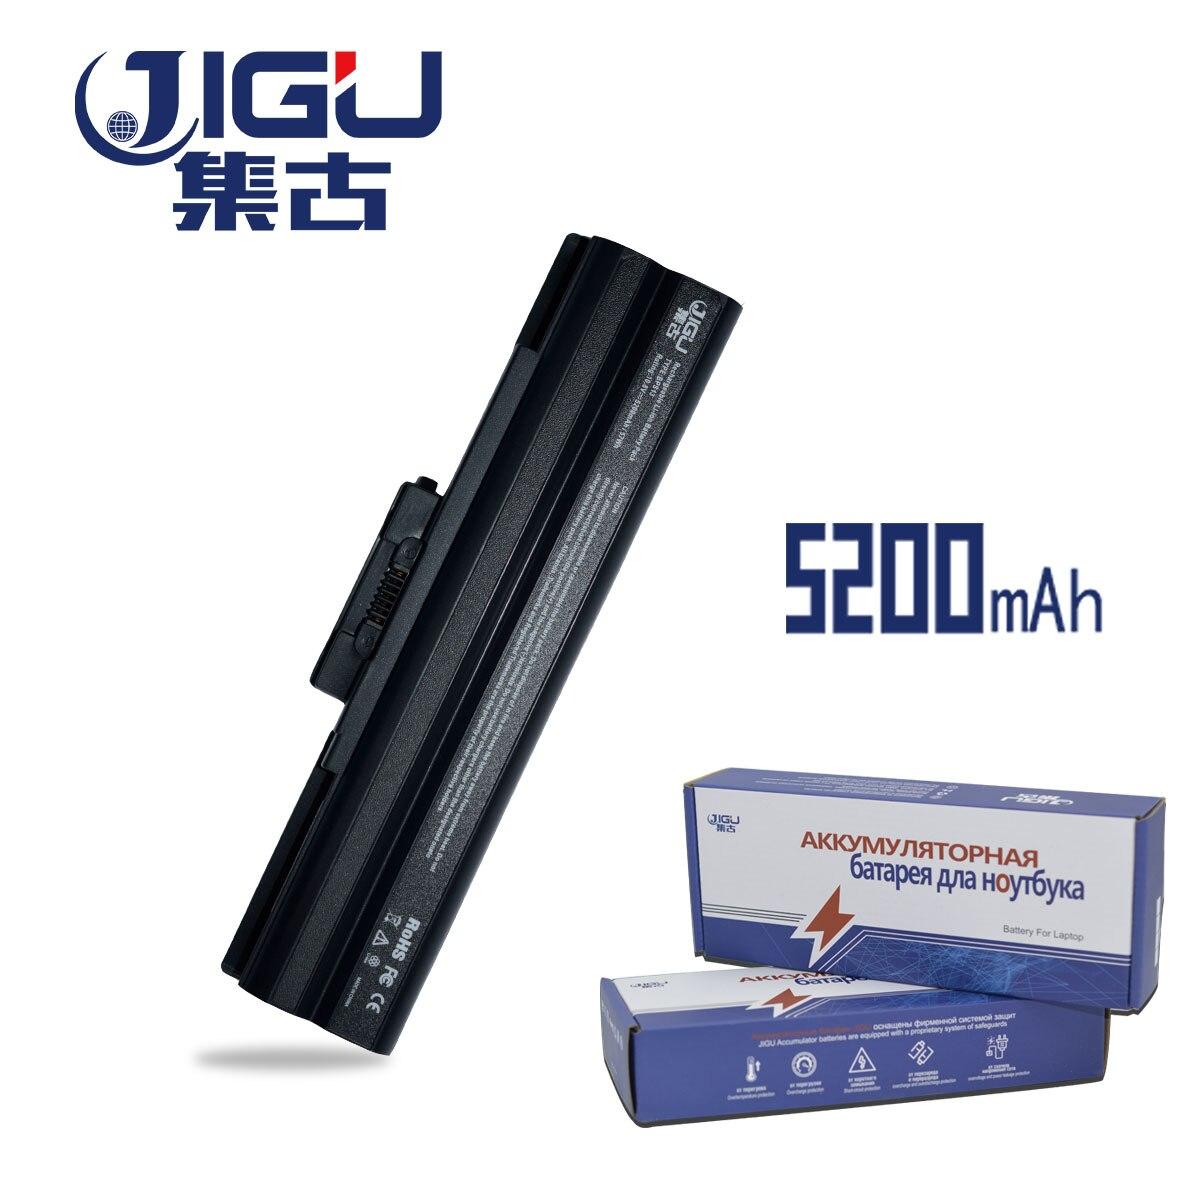 JIGU portátil batería para SONY VAIO VGP-BPS13/S VGP-BPS13A/S VGP-BPS21/S VGP-BPL21A VGP-BPS13A/B/VGP-BPS21B VGP-BPL13